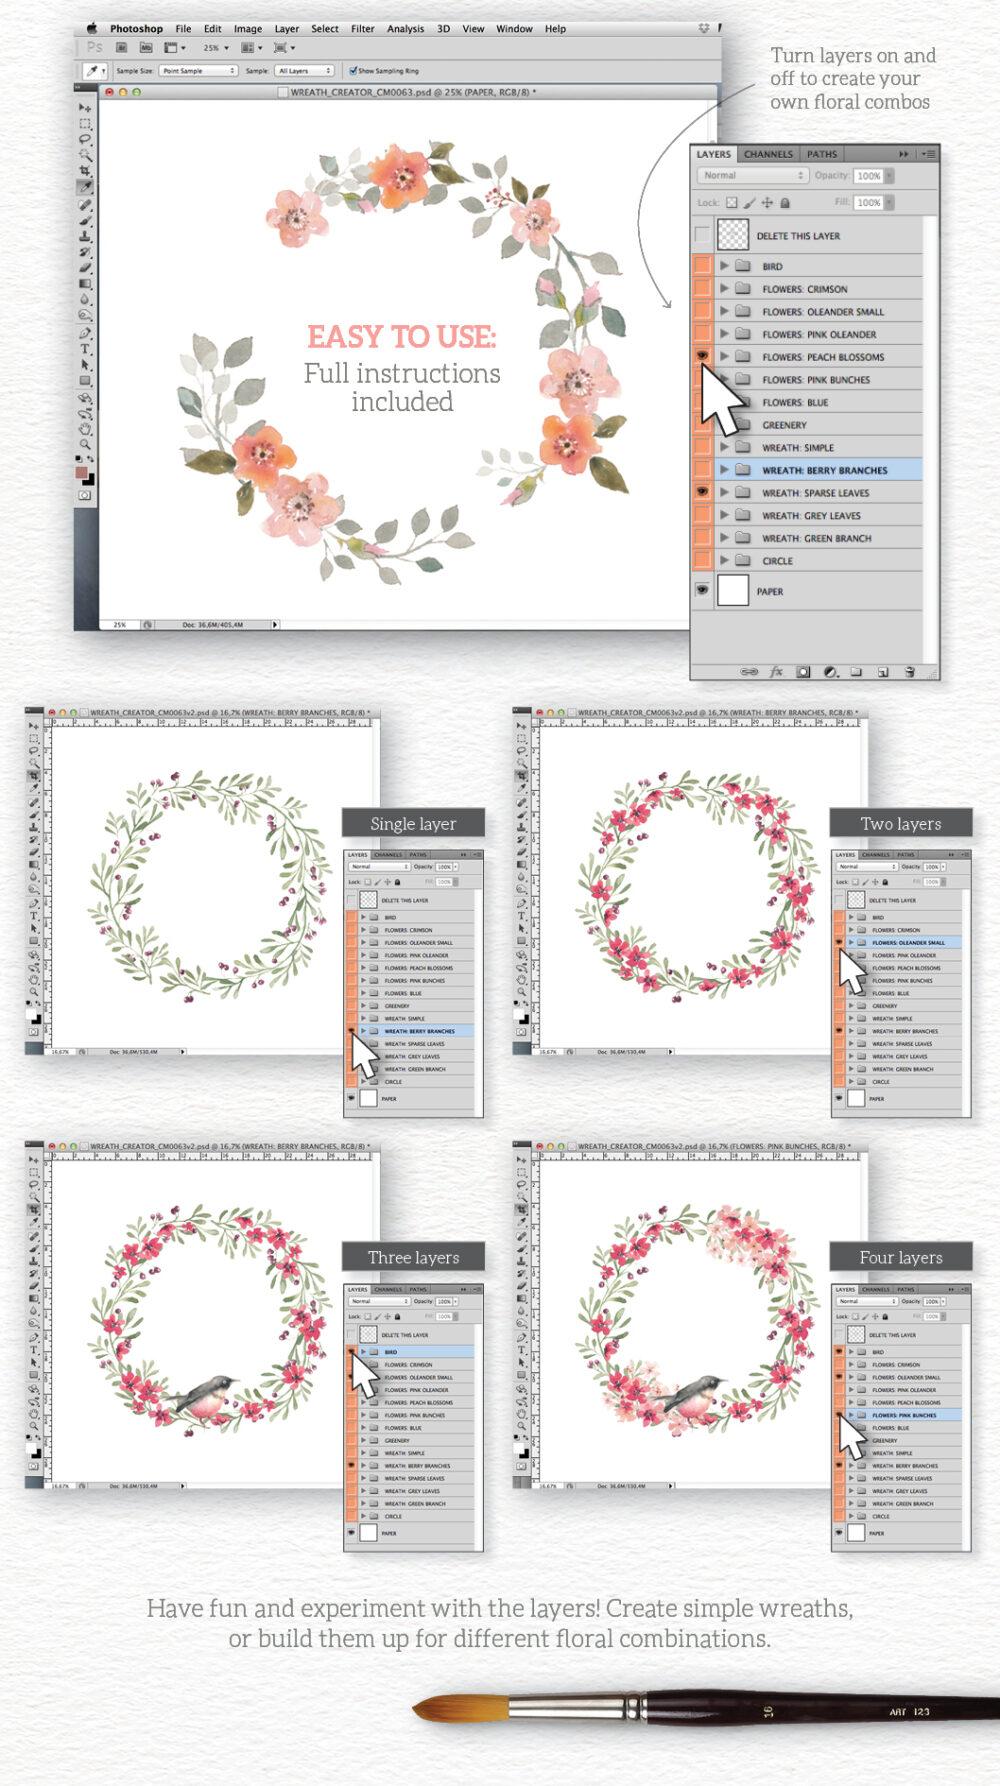 Watercolour-wreath-creator_Lisa-Glanz-03